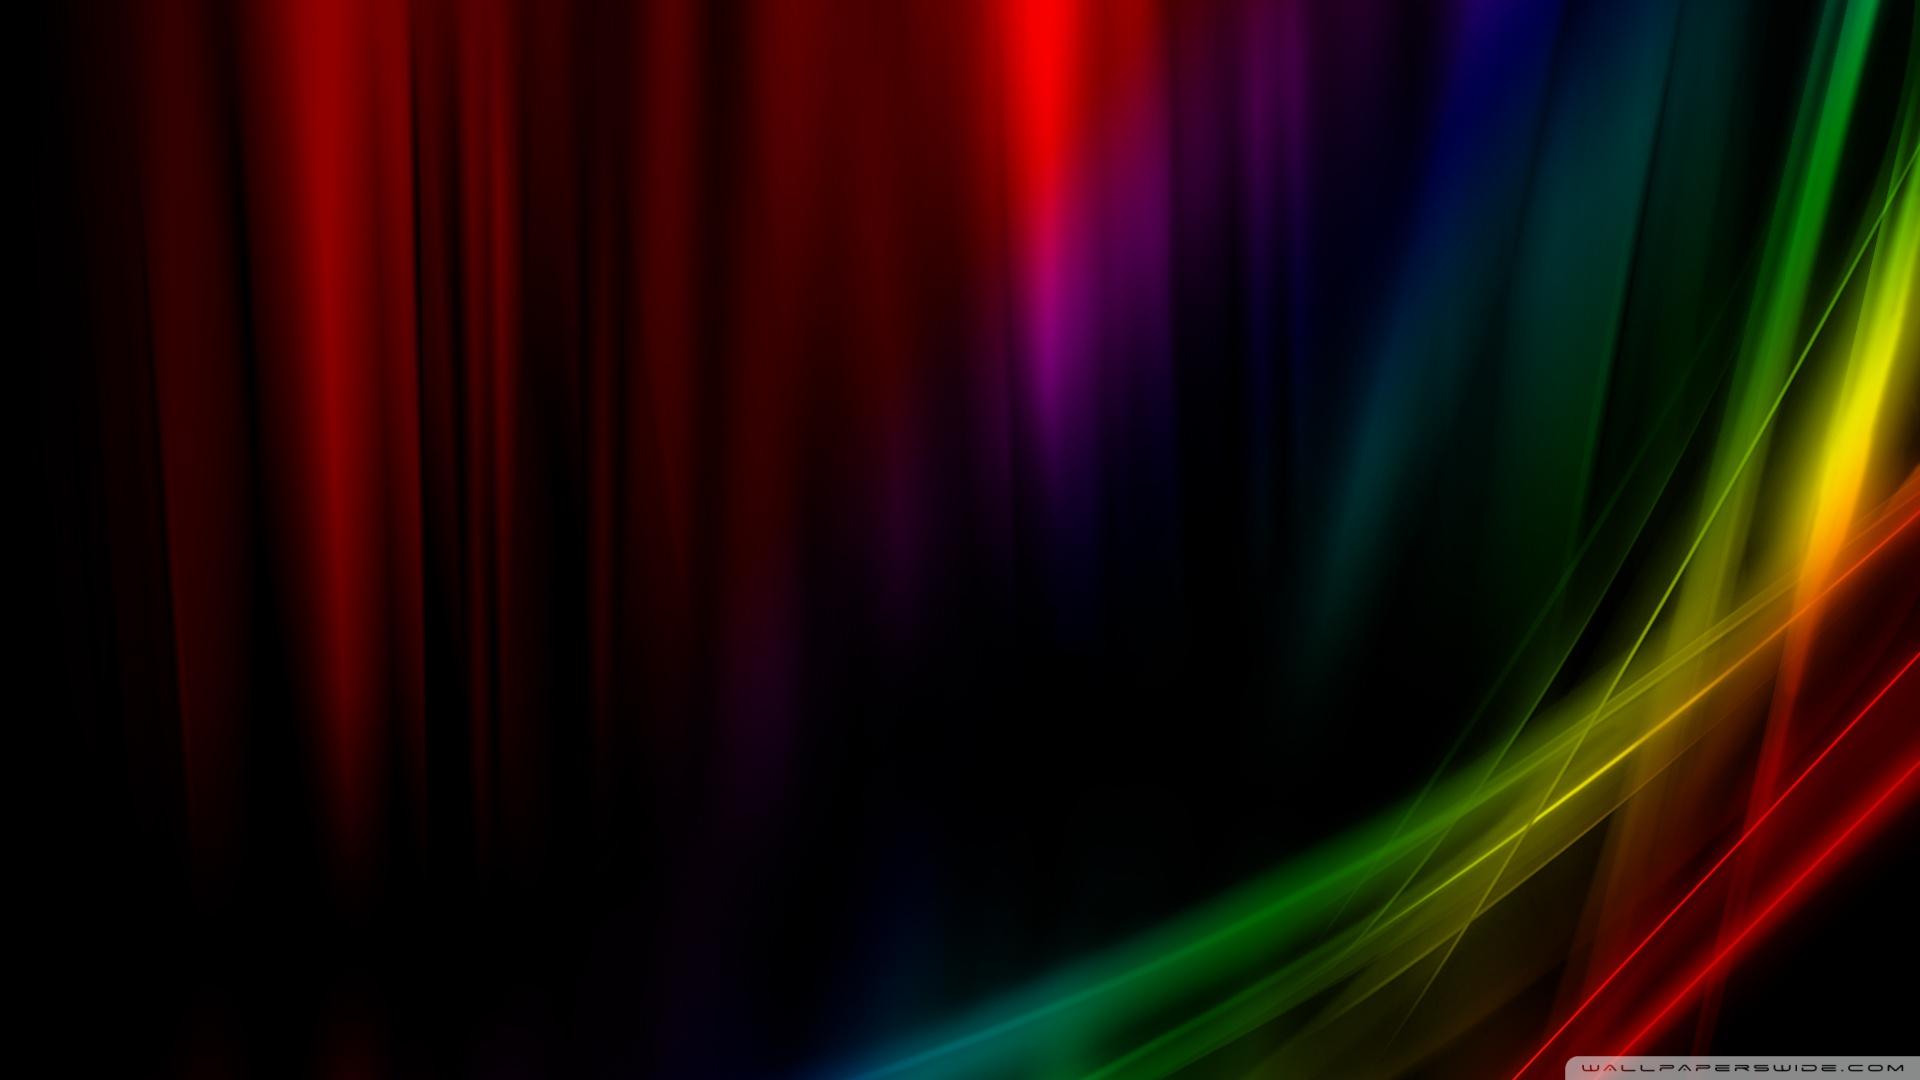 Rainbow Aurora Vista 4K HD Desktop Wallpaper for 4K Ultra HD TV 1920x1080